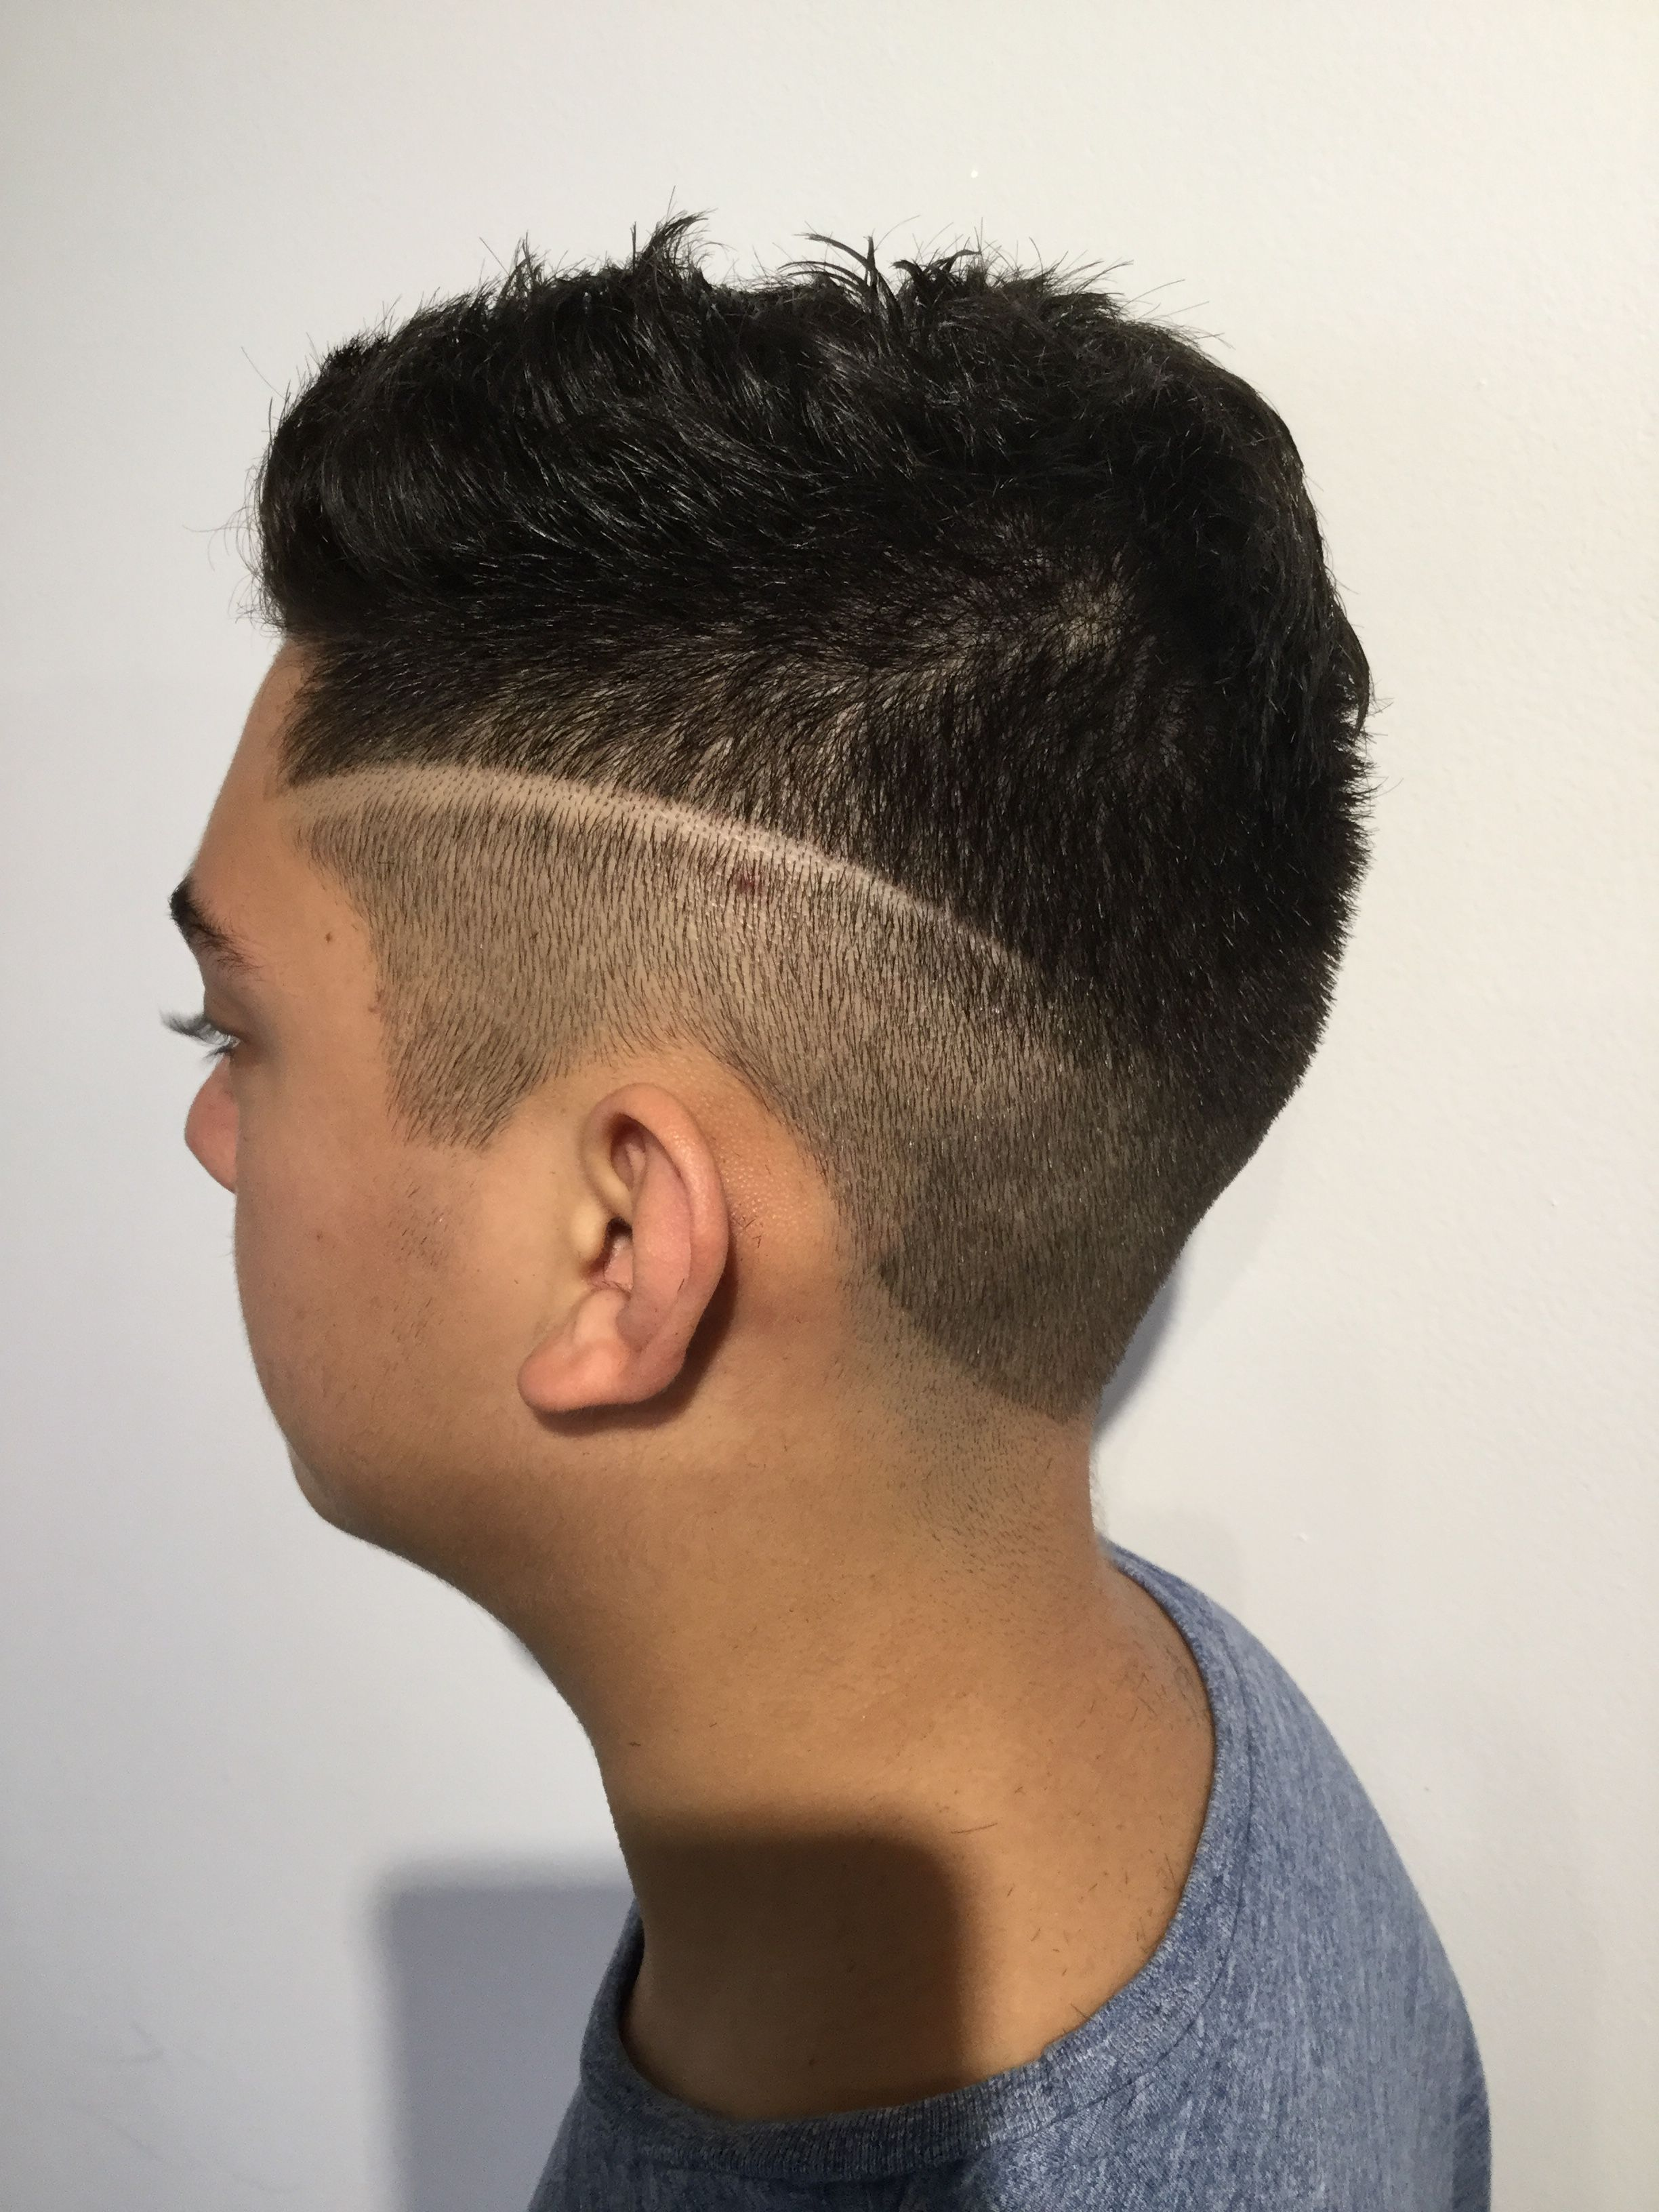 Fade Haircut With Line Design : haircut, design, Men's, Haircuts